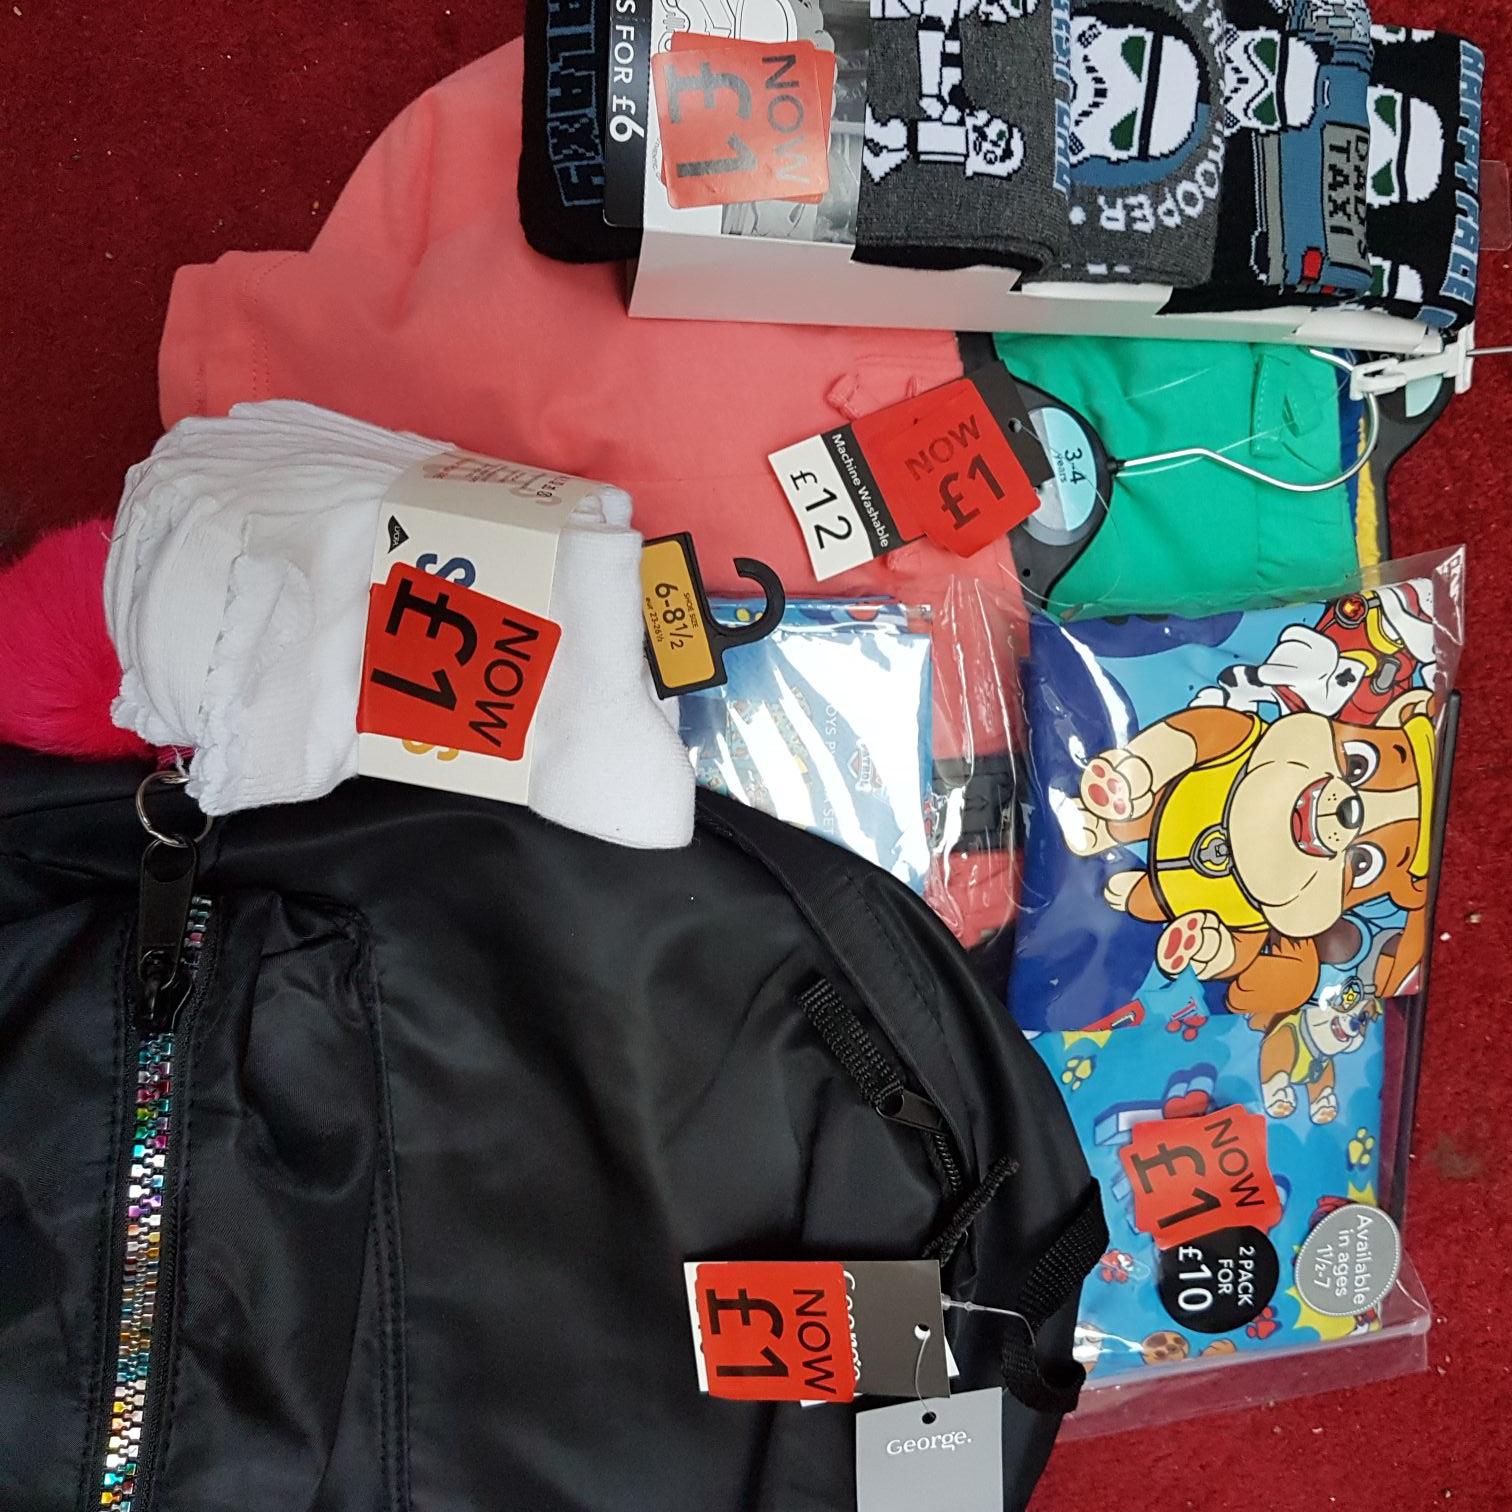 Asda - clearance clothes - school bags 1.00 - pjs 1.00 - shorts 1.00 etc